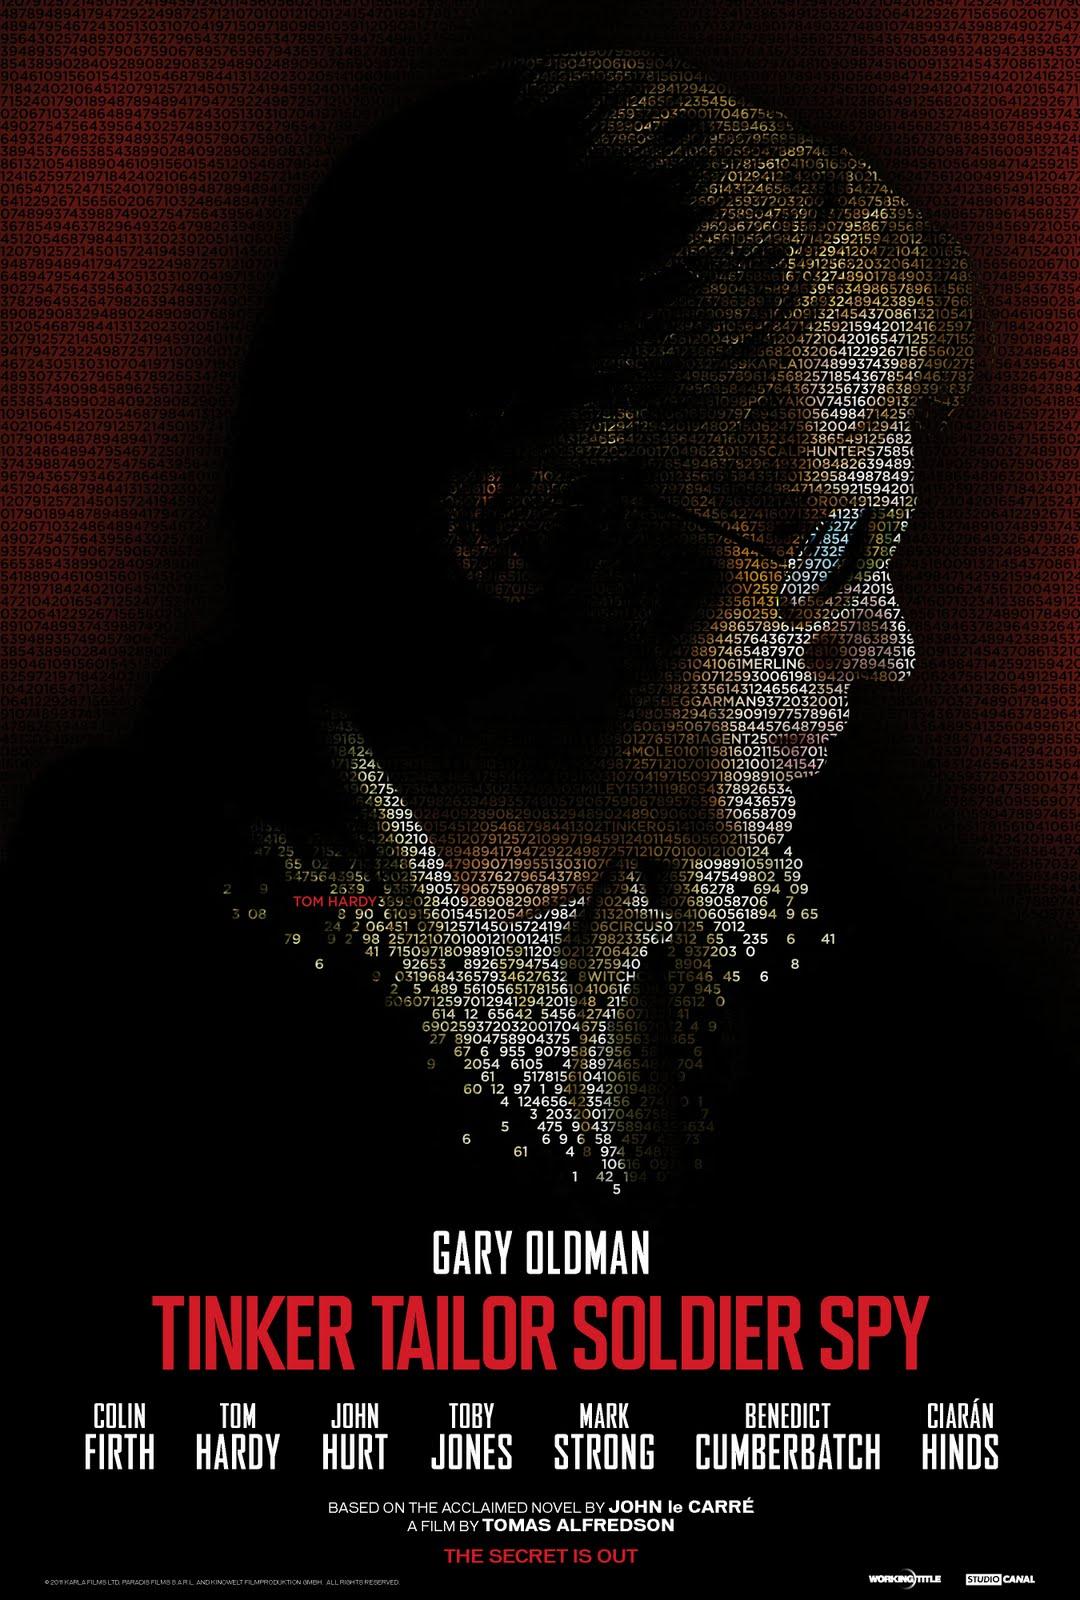 http://2.bp.blogspot.com/-eMYLsFsobzg/Tk0uuDoejKI/AAAAAAAAAwA/yYwql-r2g3I/s1600/tinker-tailor-soldier-spy-movie-poster-tom-hardy.jpg